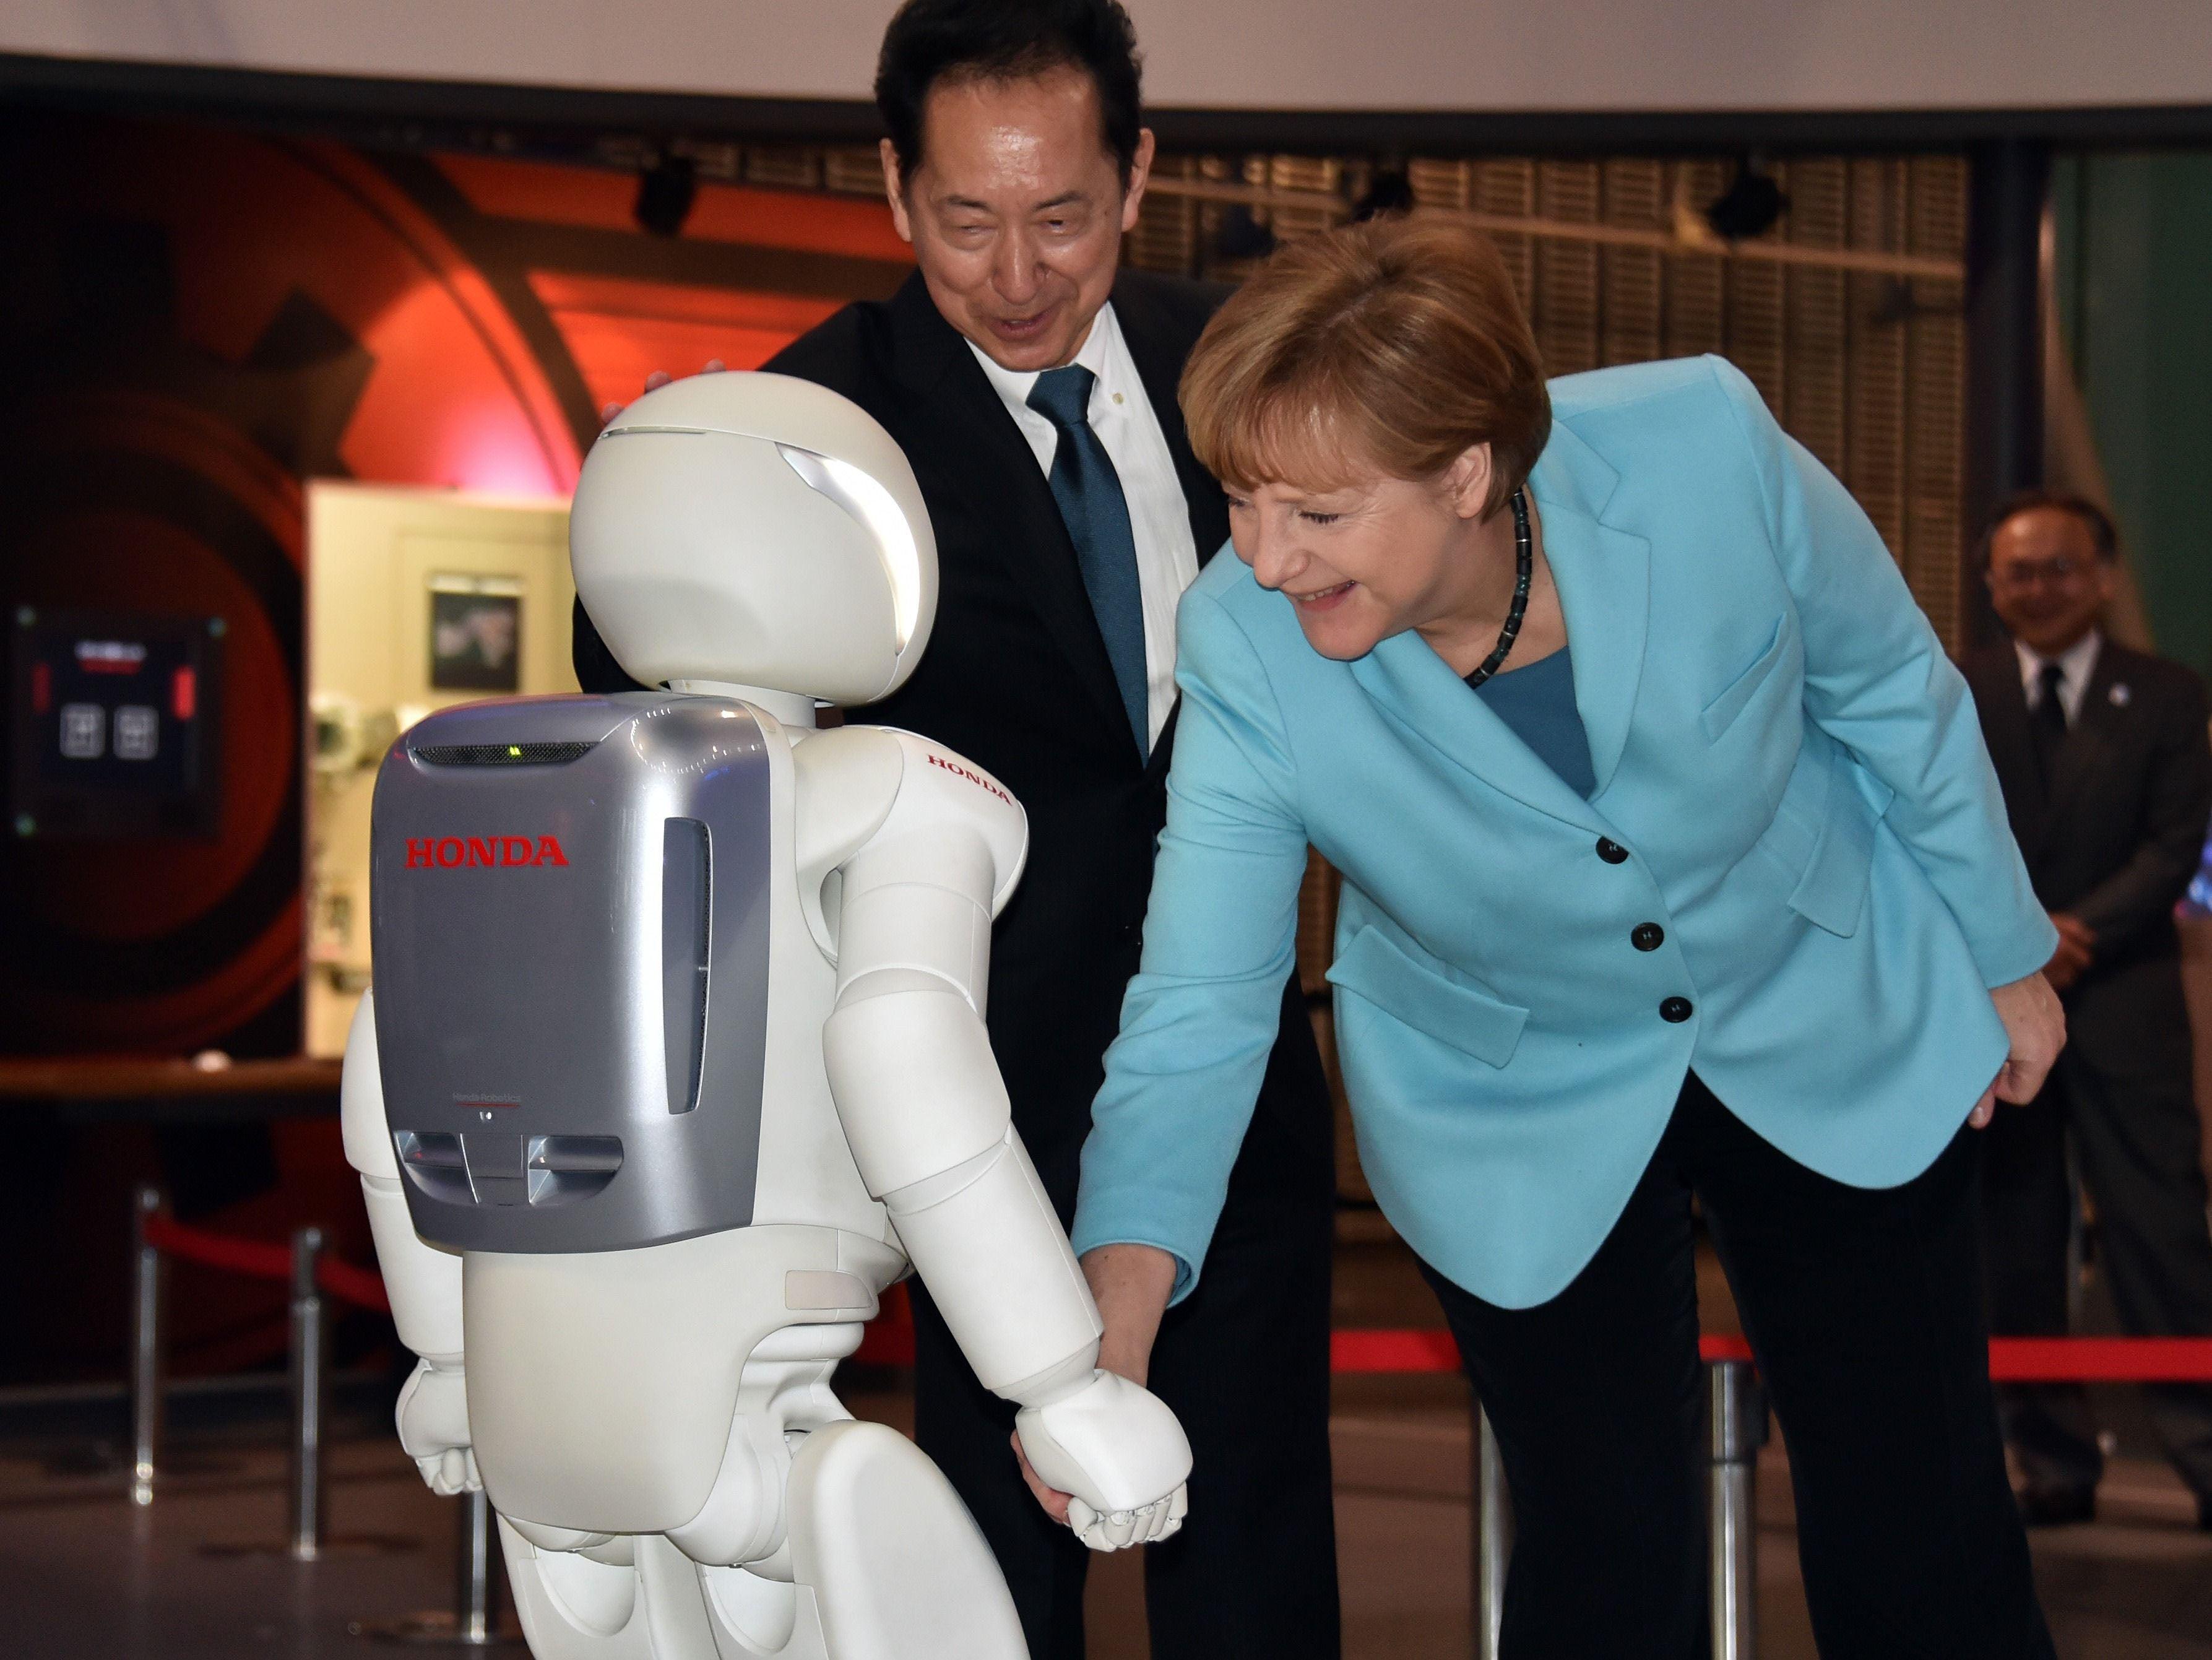 Why Is Angela Merkel Always Palling Around With Robots?